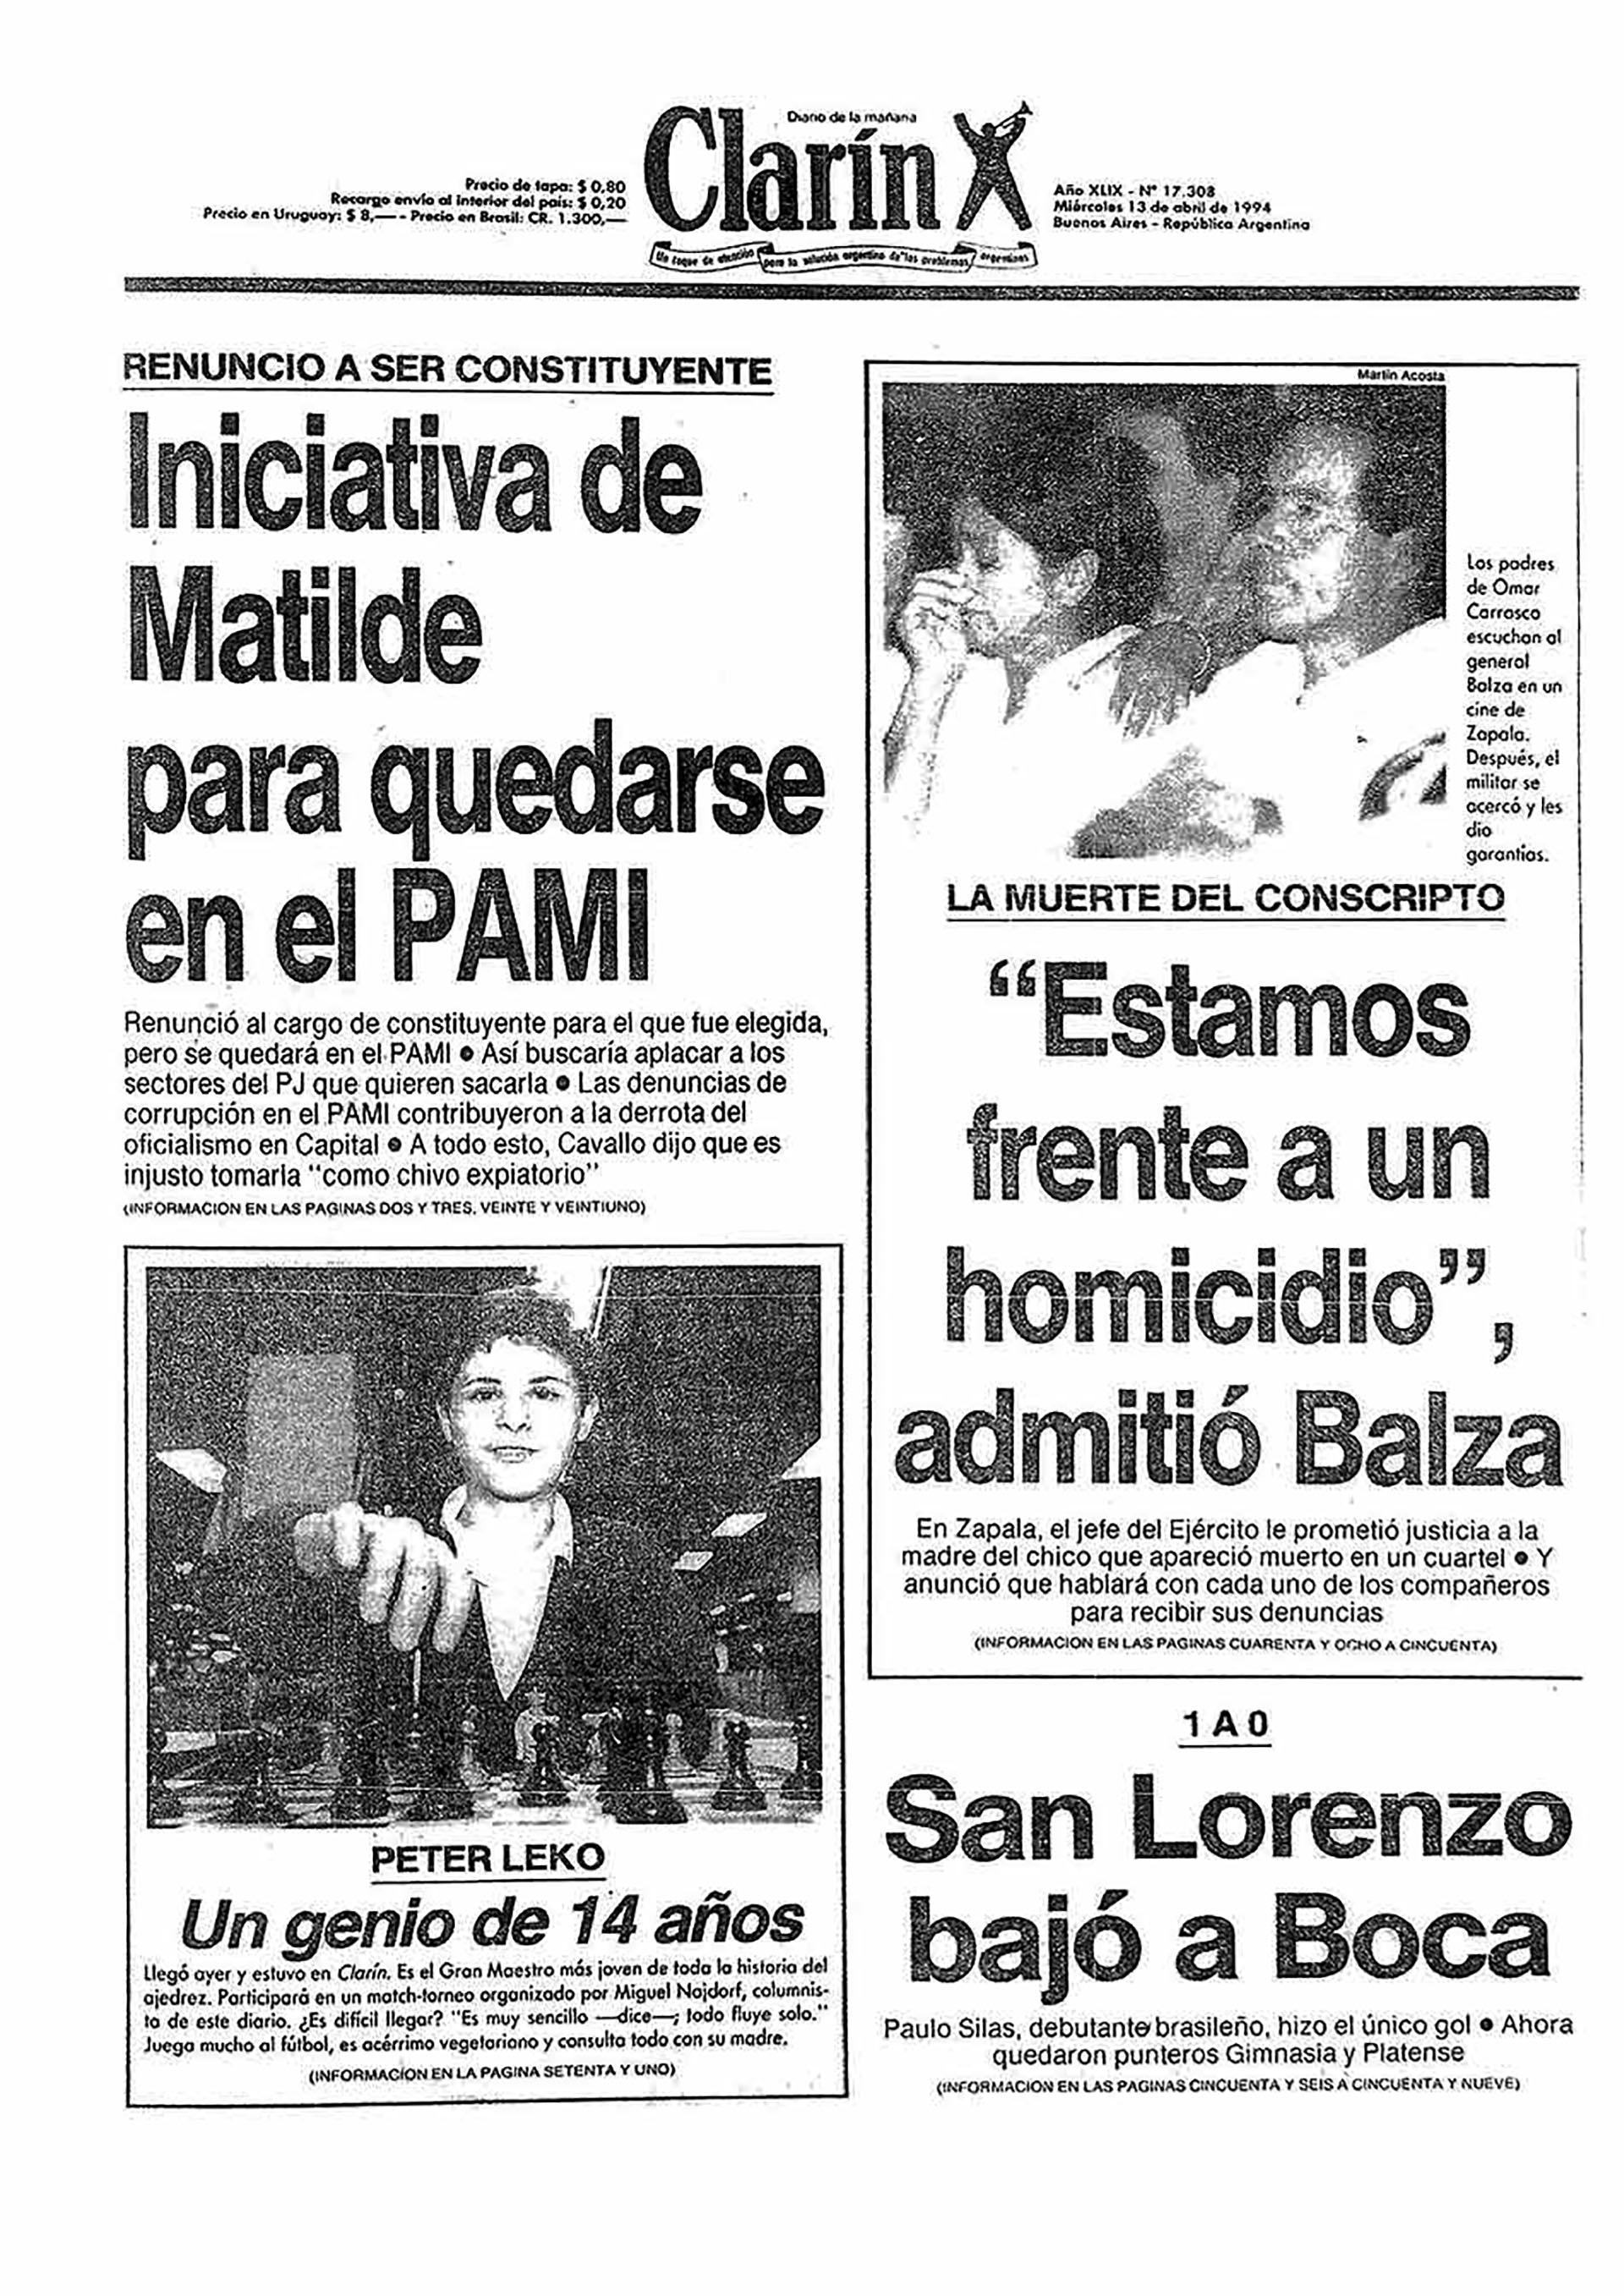 Clarin caso carrasco SF 13 abril 1994